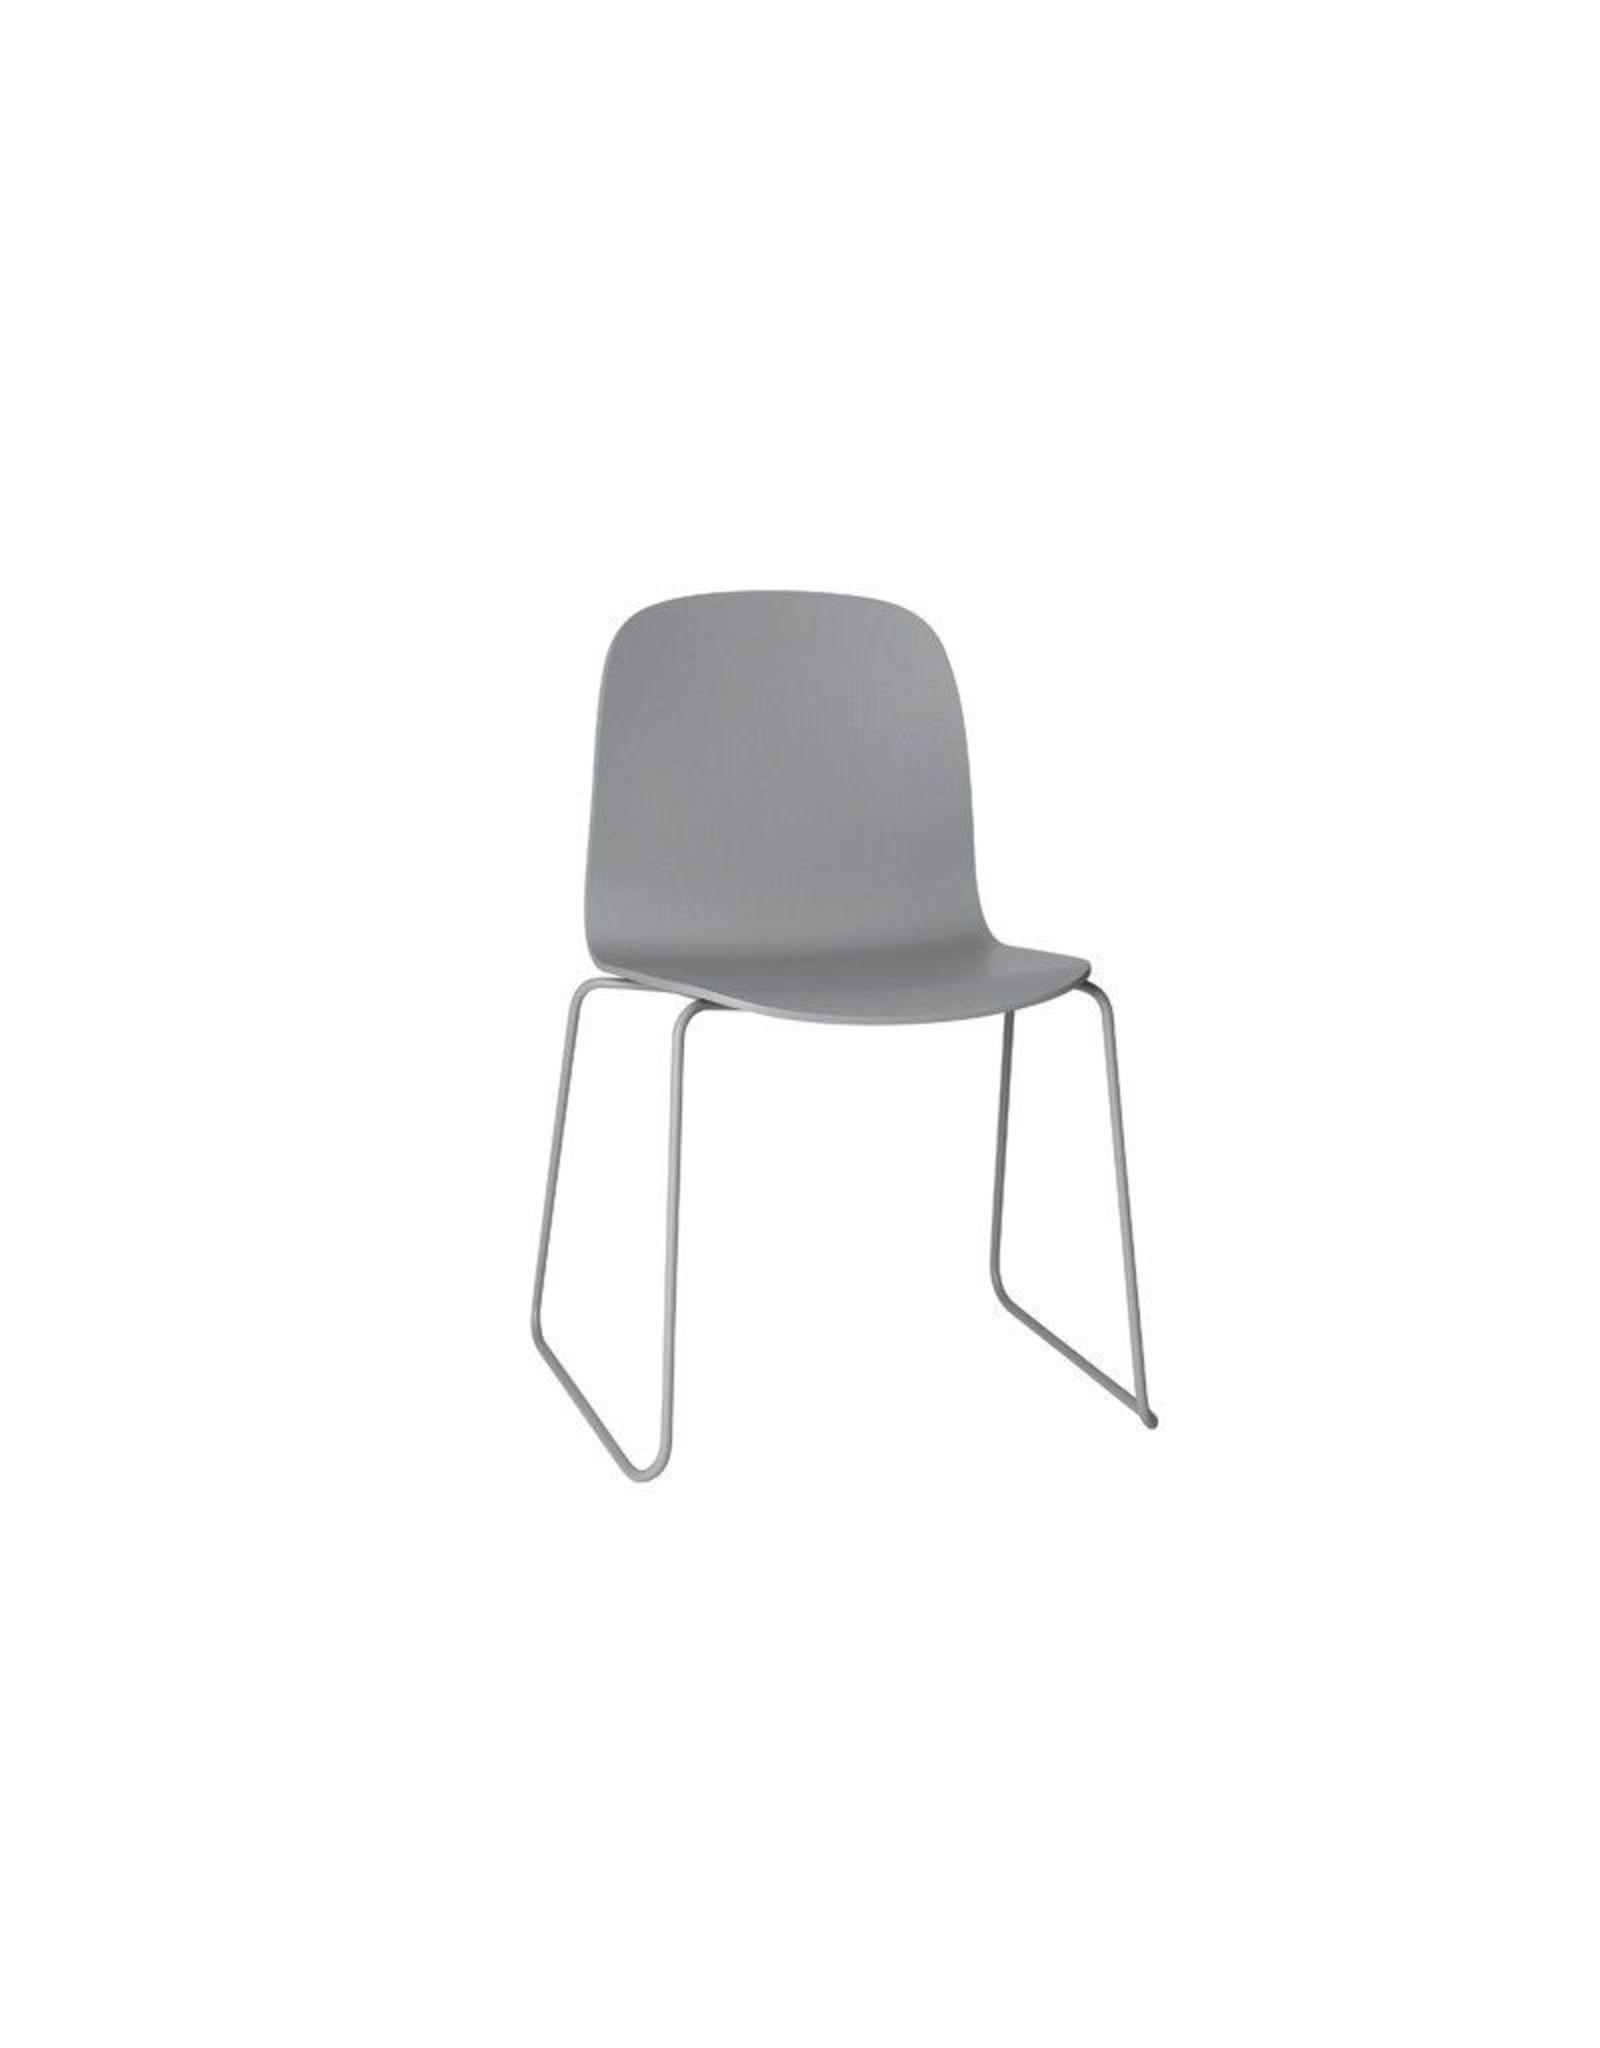 Muuto Visu Chair Sled Base Grey/Grey